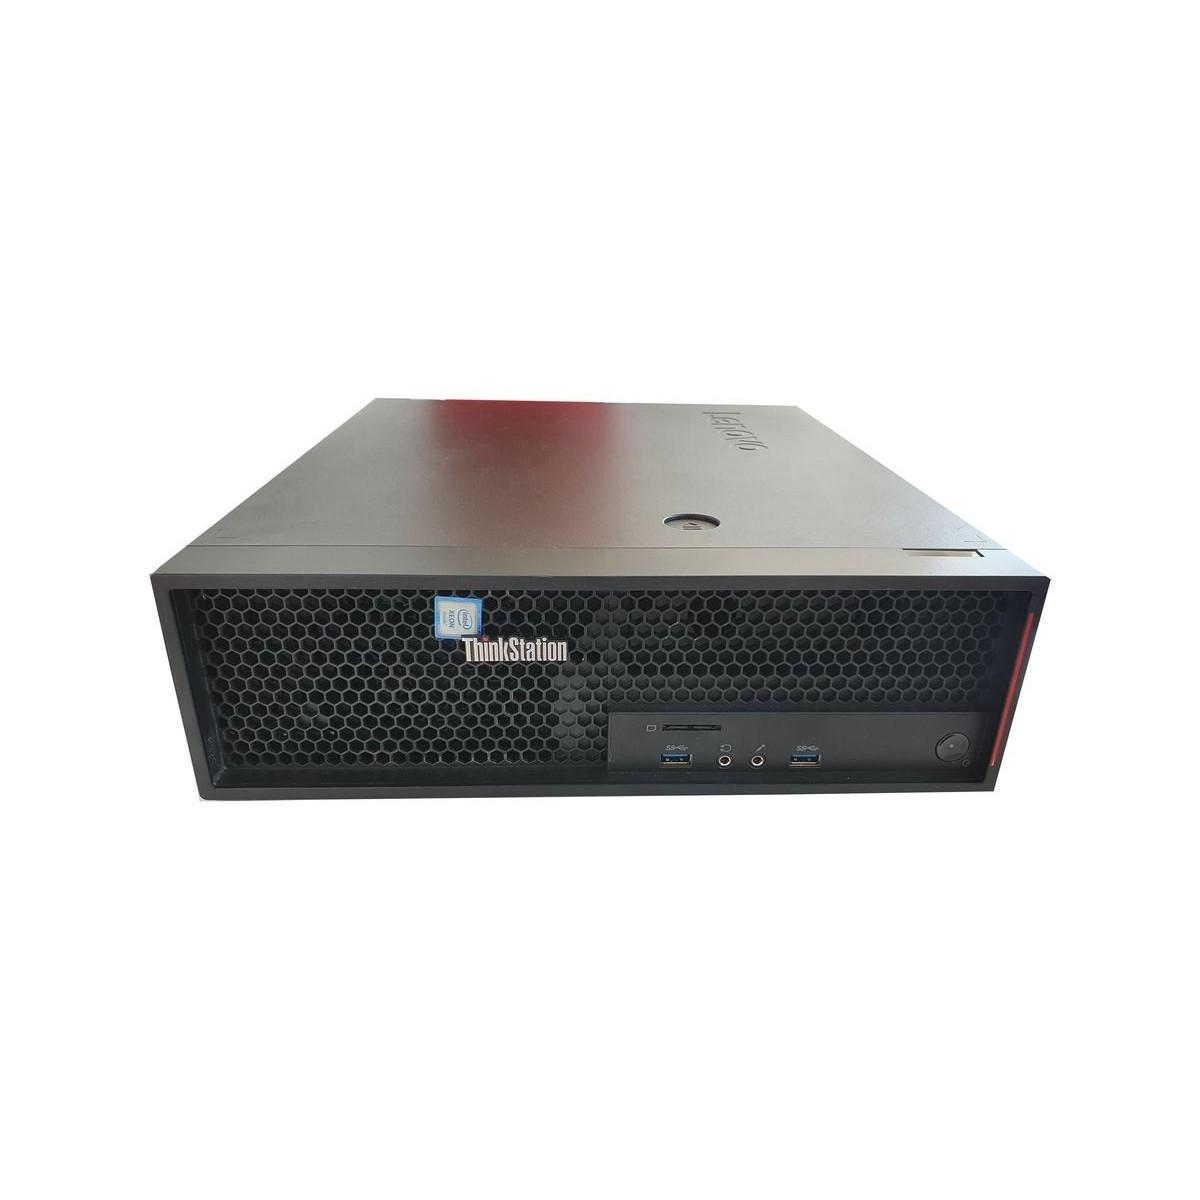 LENOVO P320 E3 v5 32GB 256SSD P600 WIN10